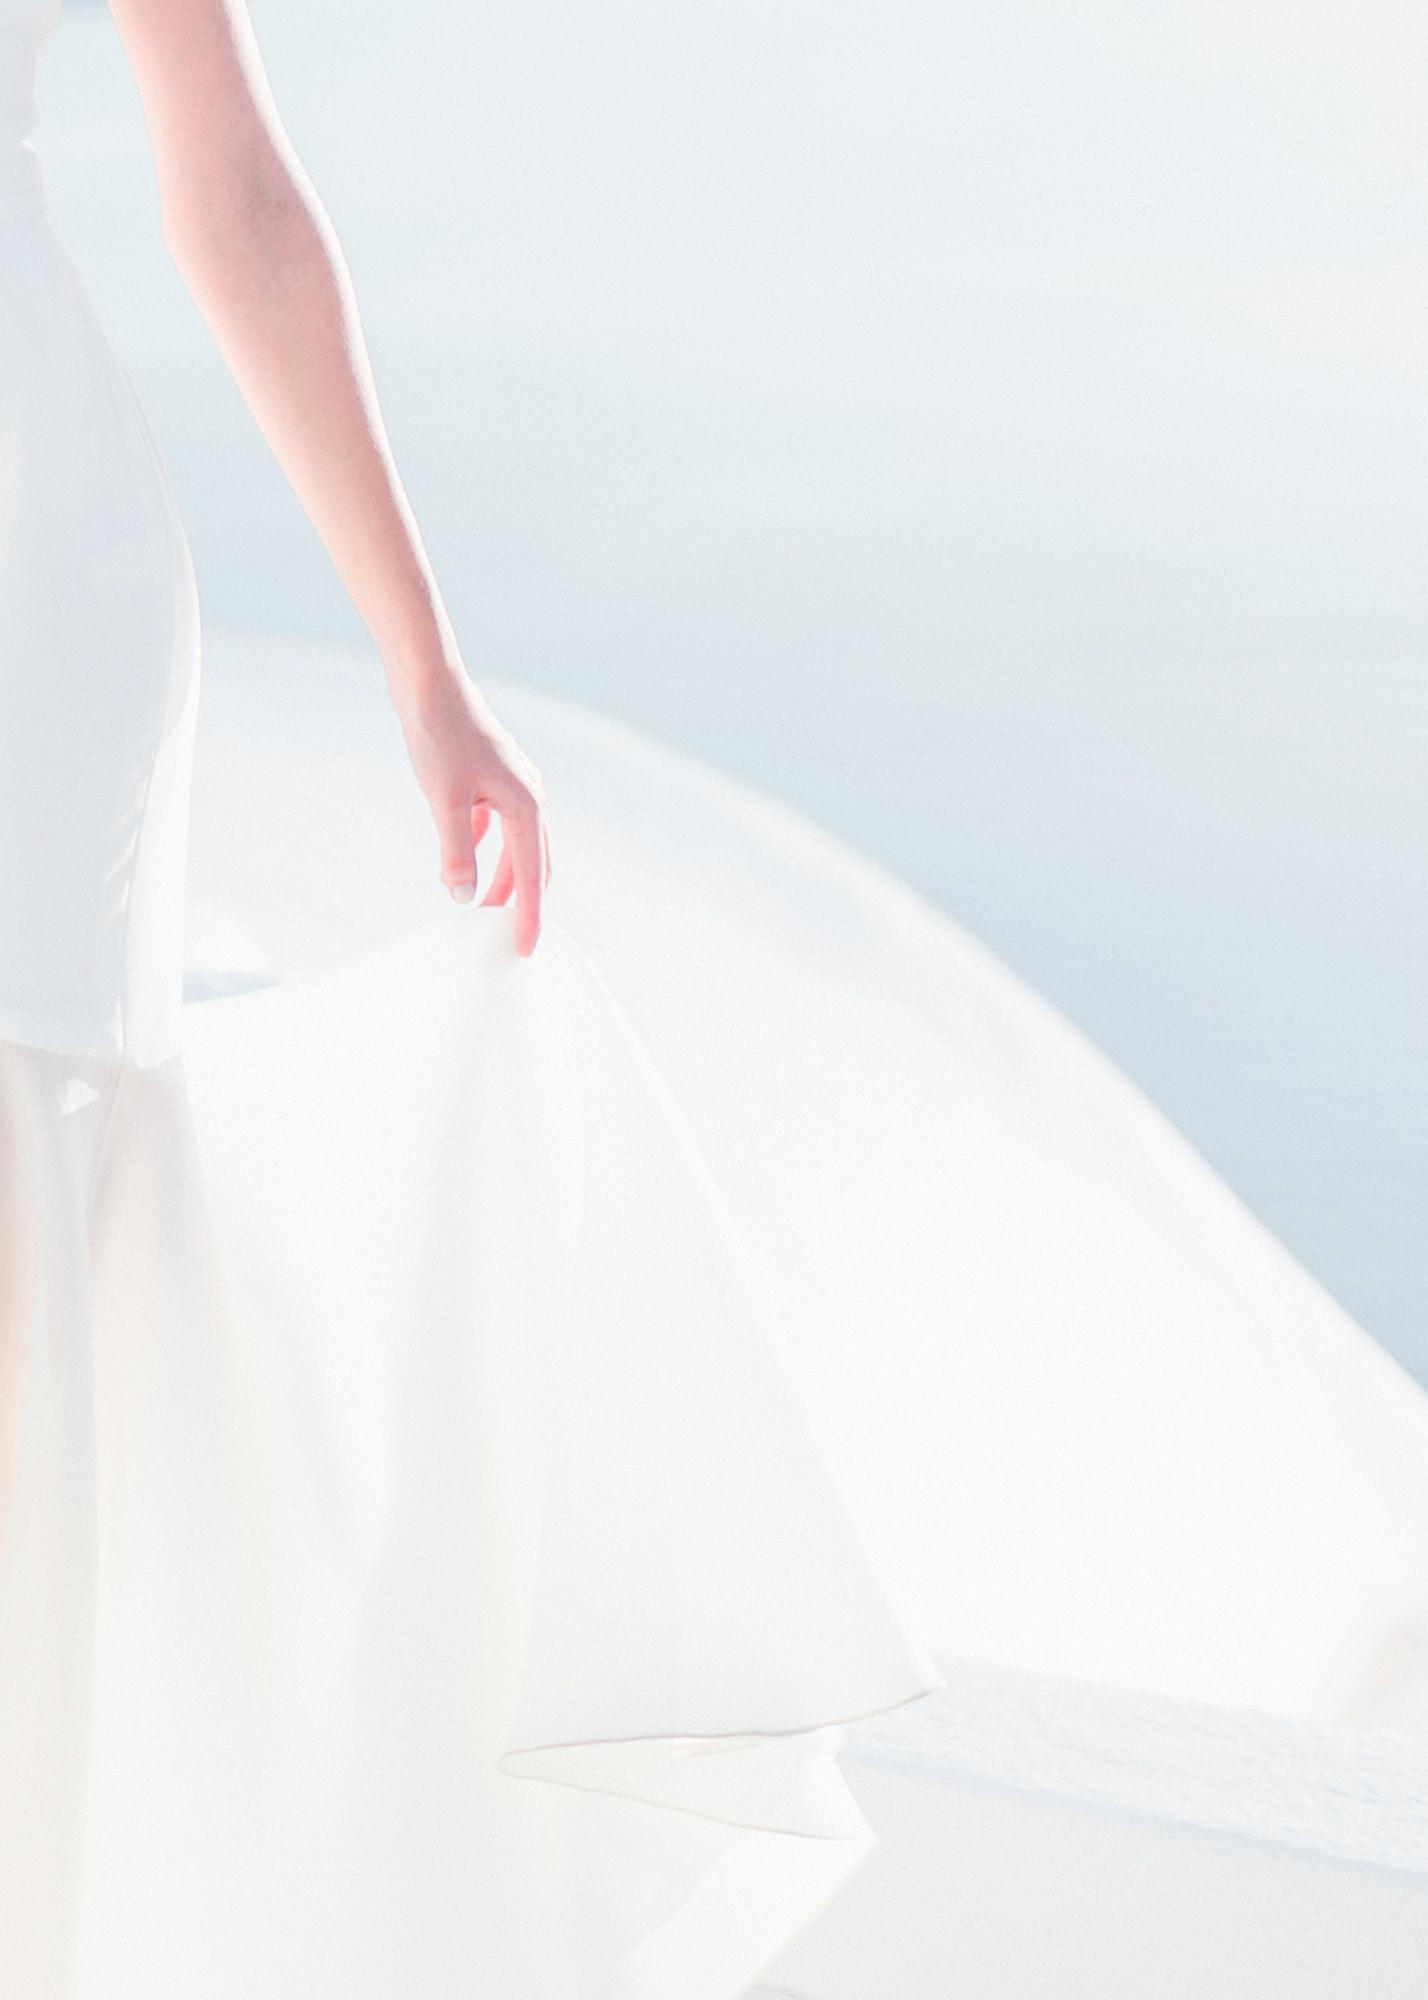 46-portrait-santorini-wedding-photographer-greece-b-v